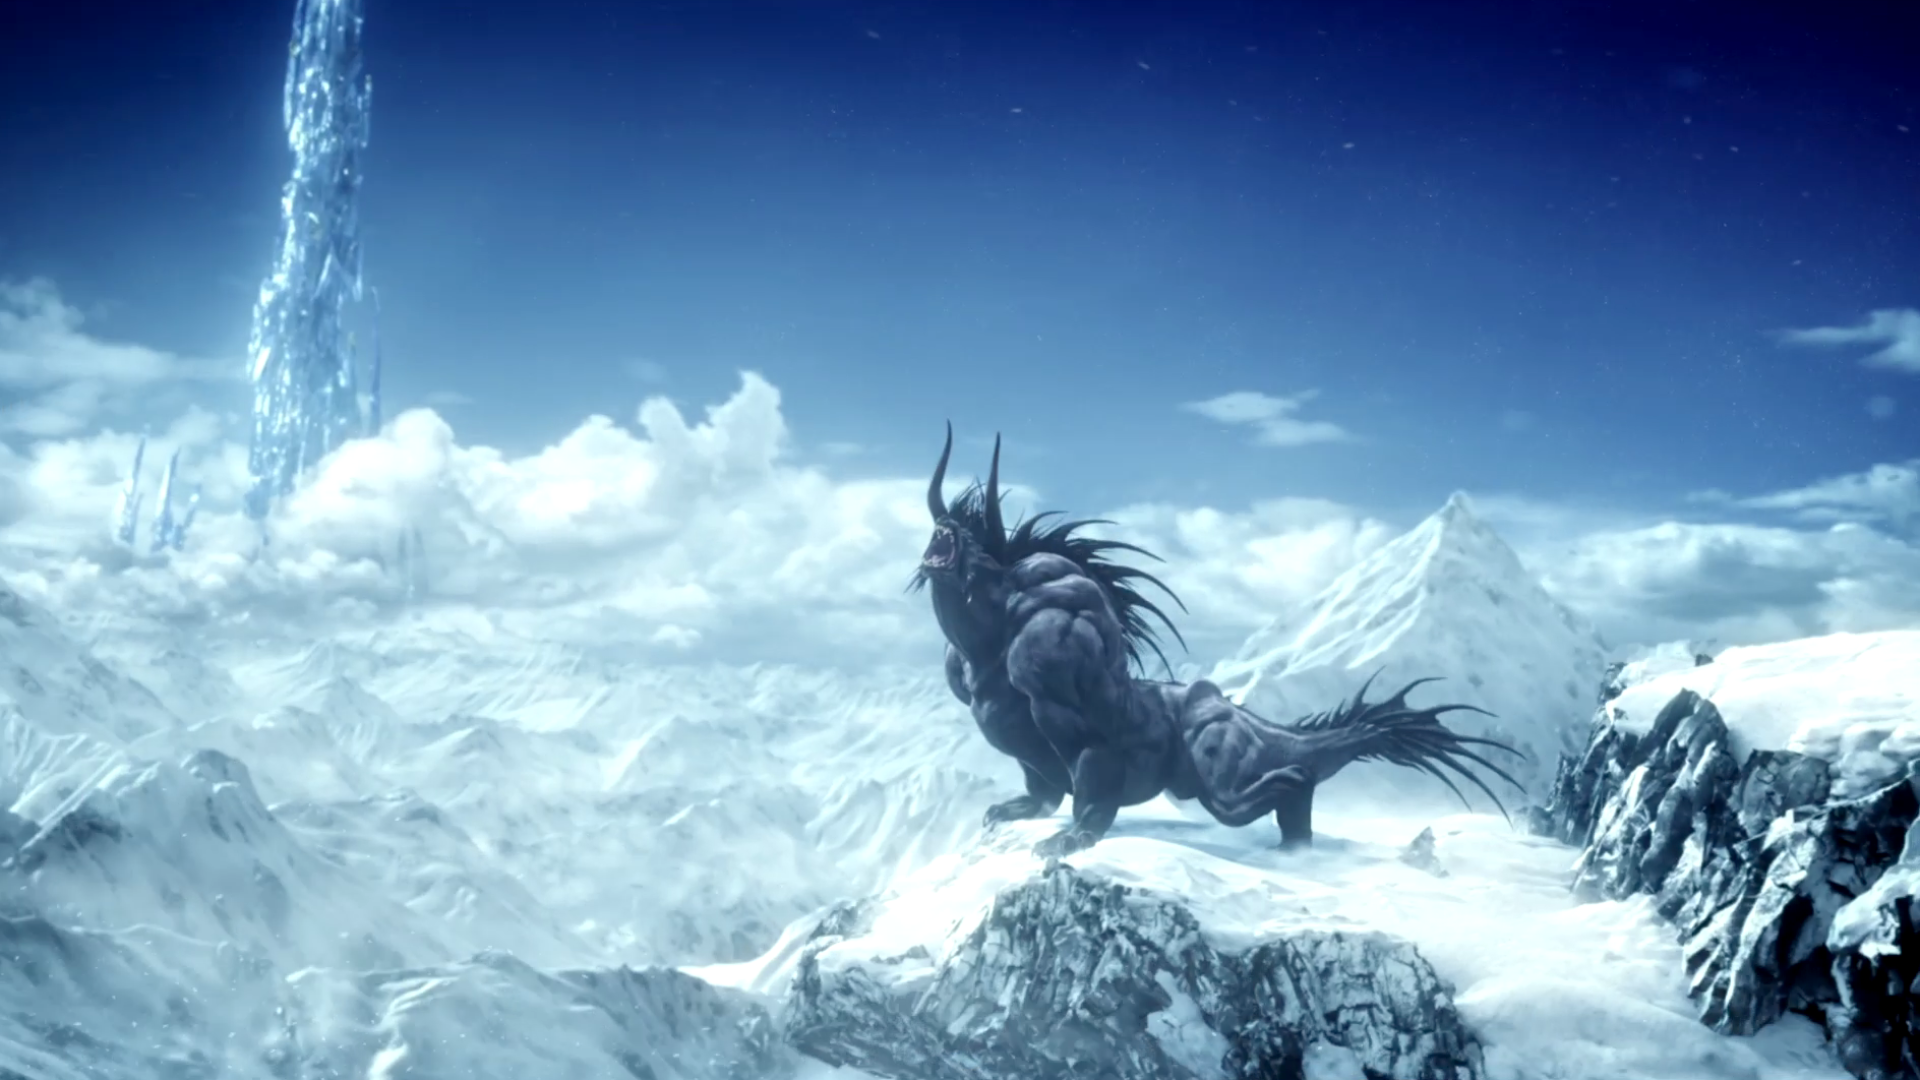 final fantasy a Realm Reborn 2601